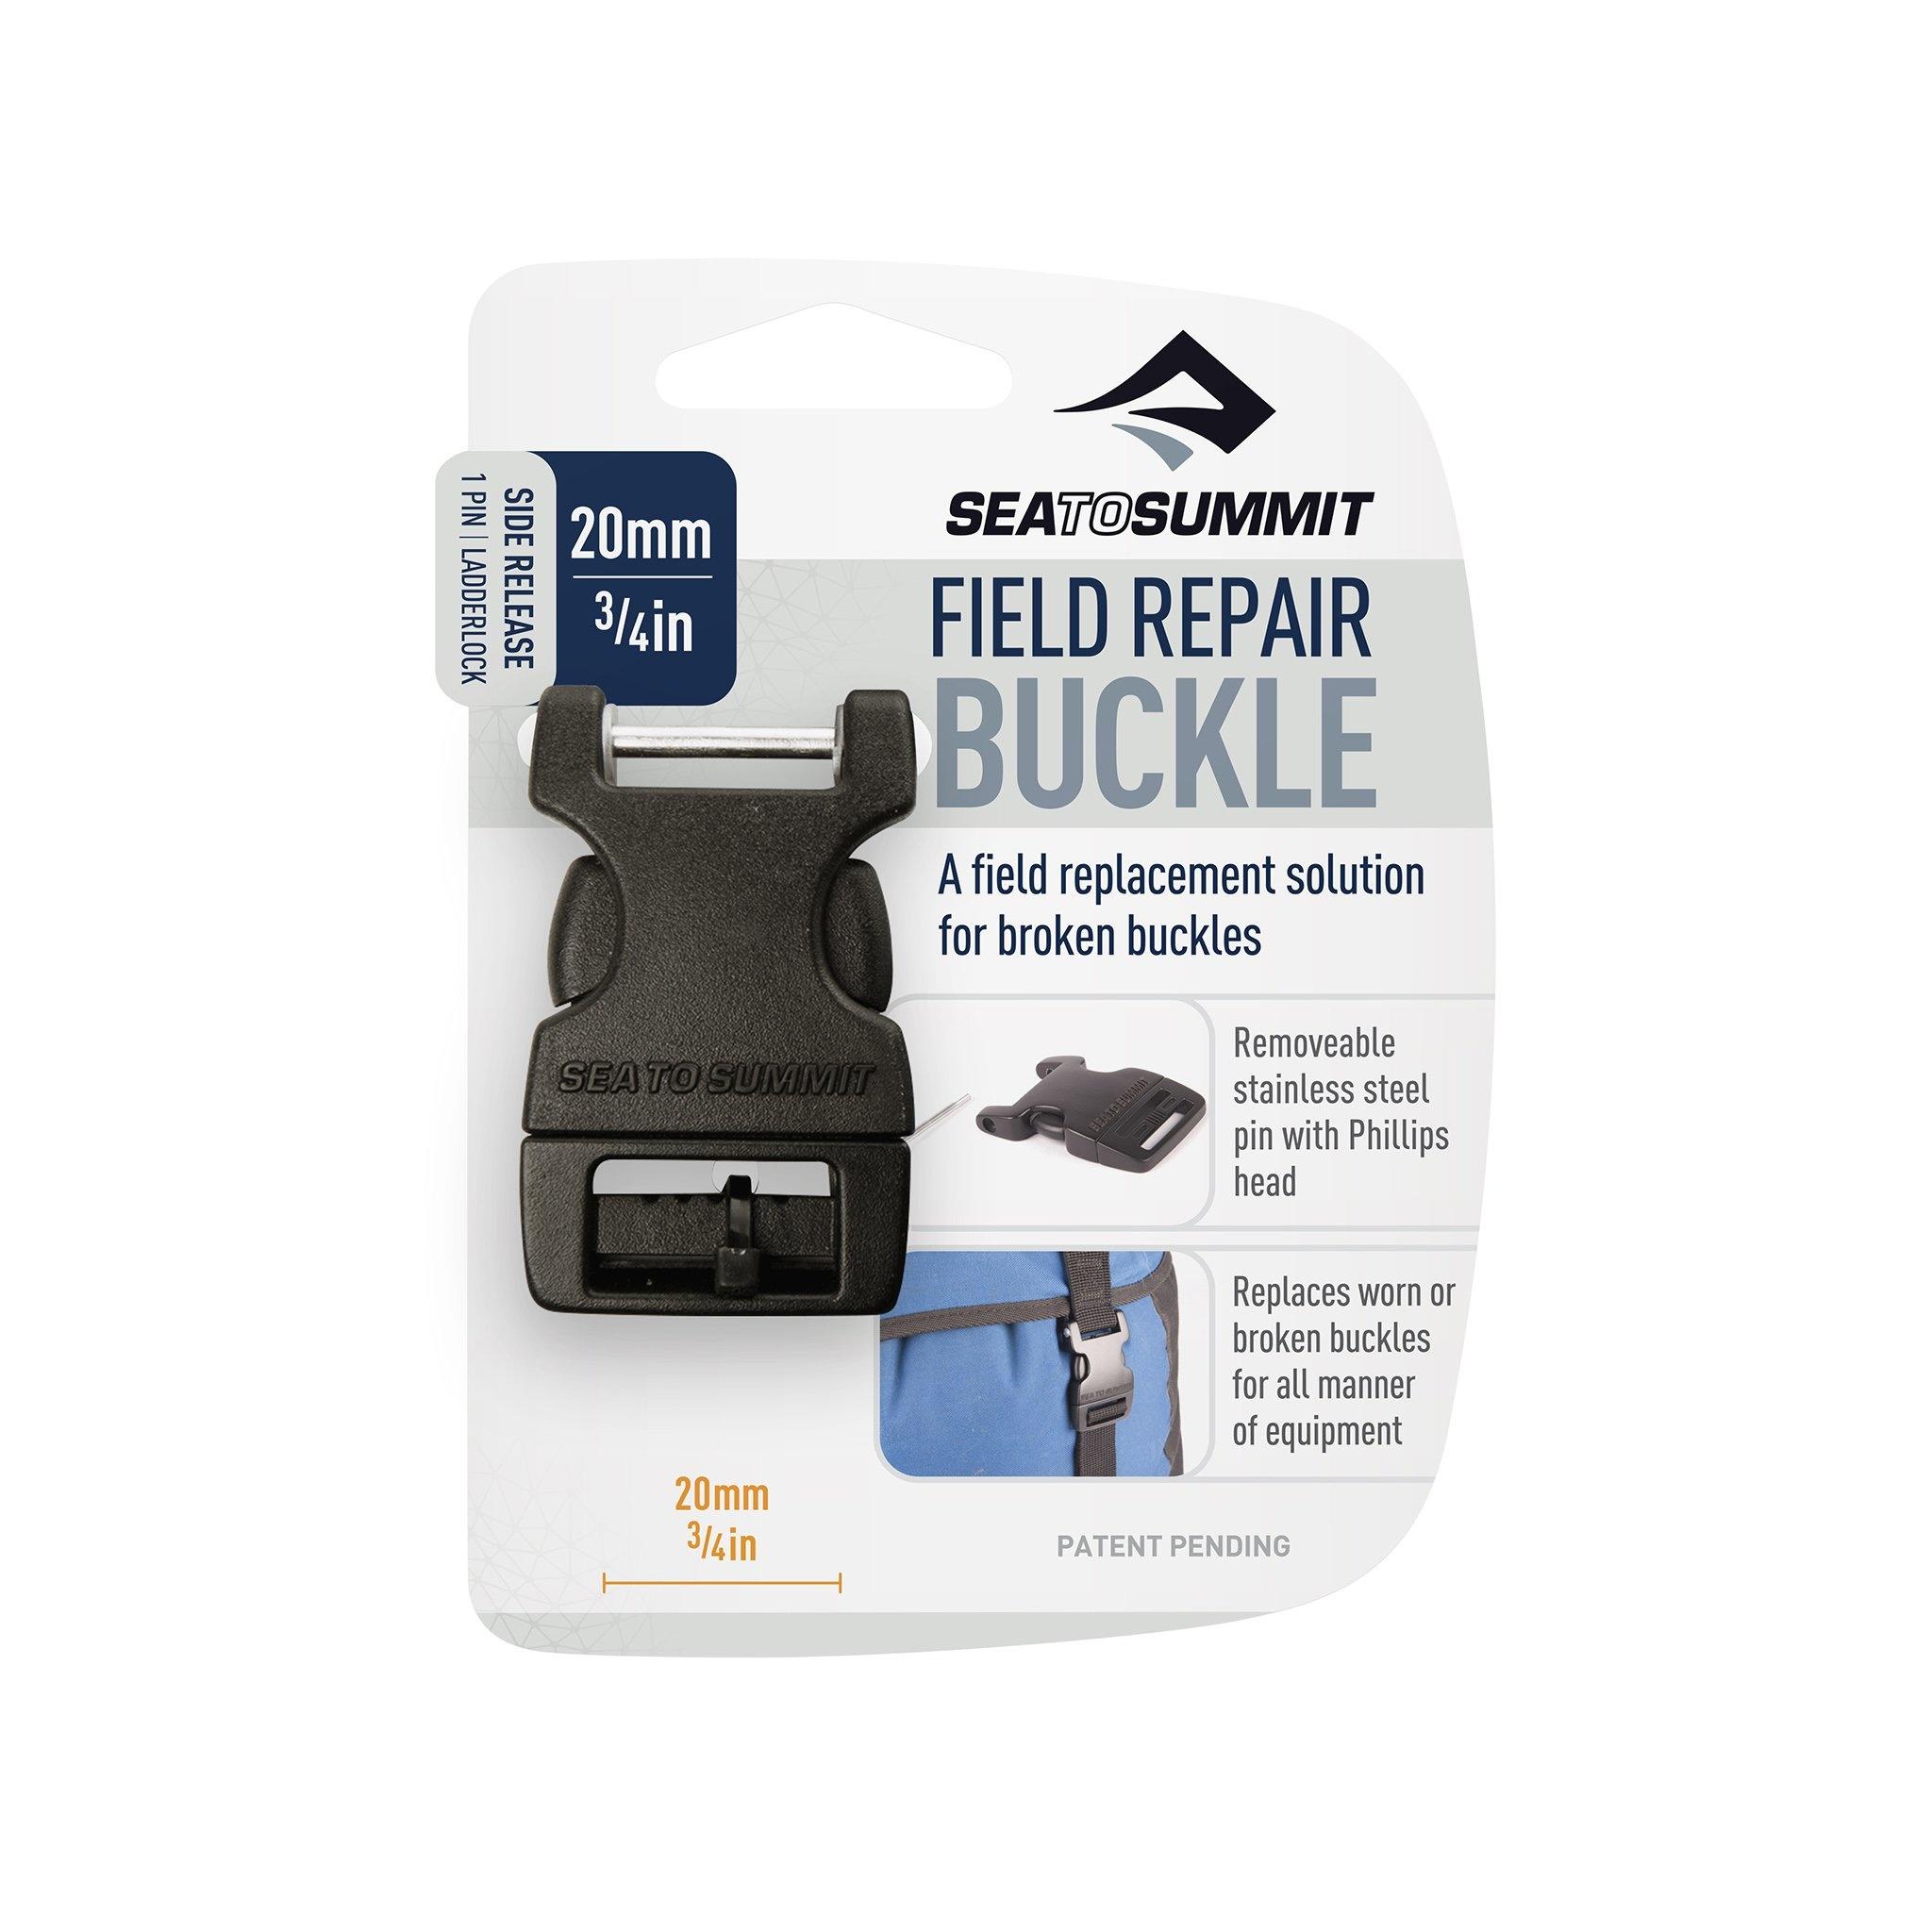 "Sea to Summit Field Repair Buckle 20mm / 3/4"" Side Release 1 Pin"